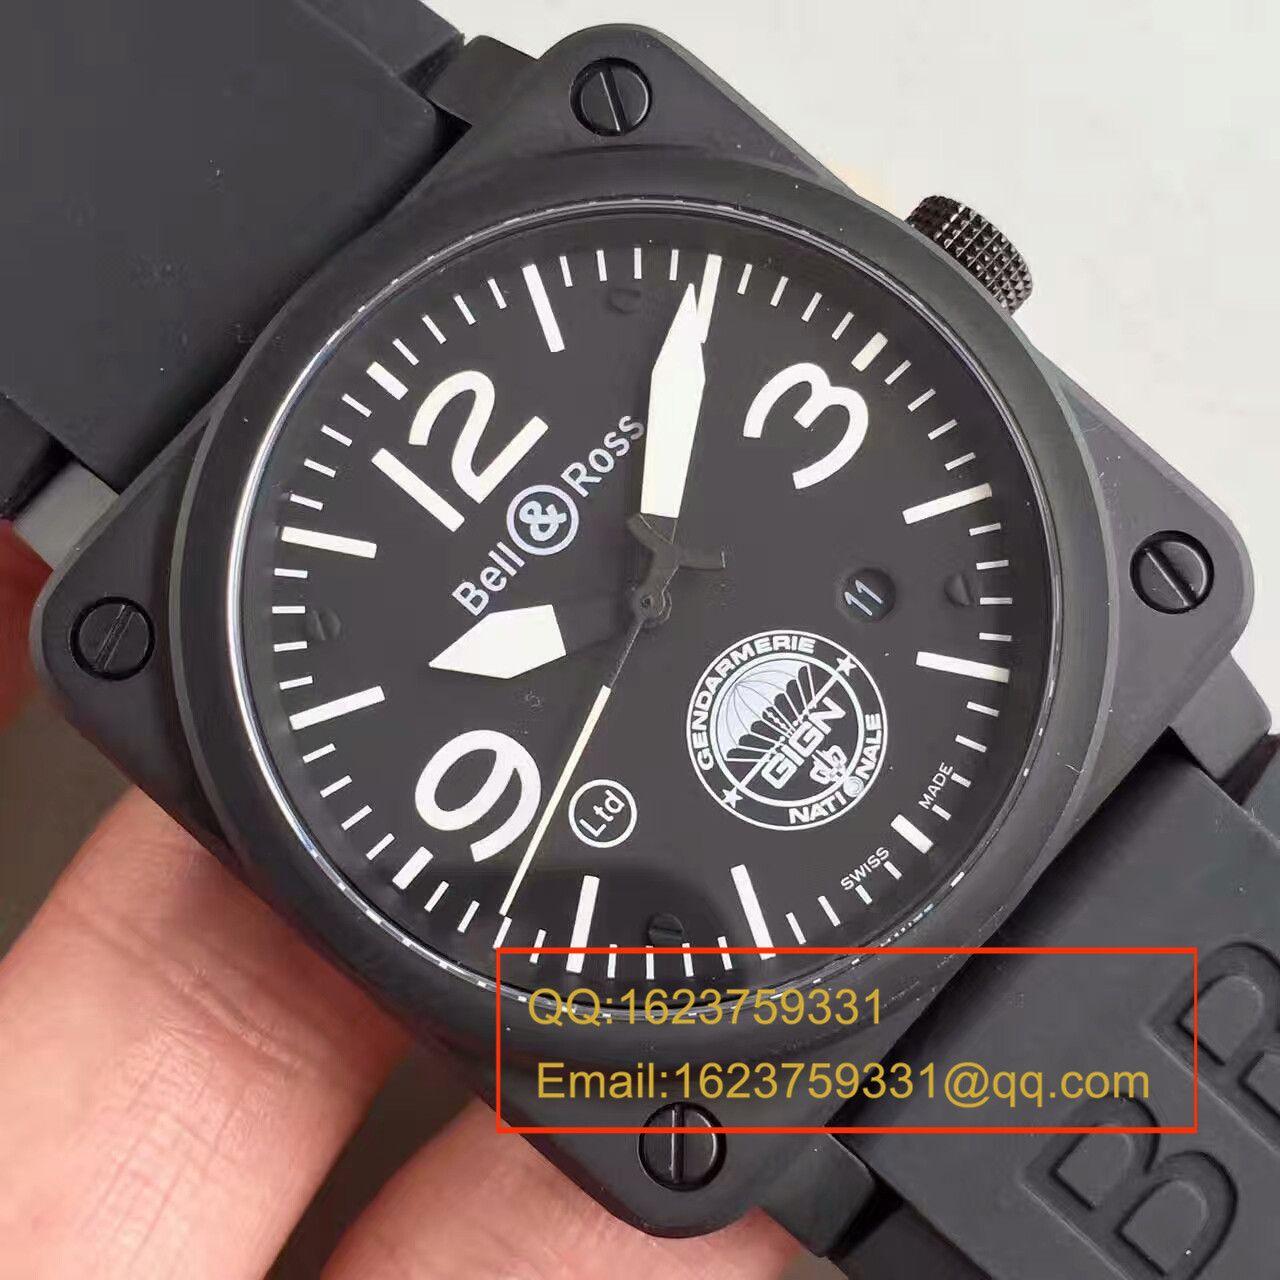 【BR厂一比一复刻手表】柏莱仕法国国家宪兵特勤队设计制造GIGN 专属特别版腕表 BR03-92 / BL012